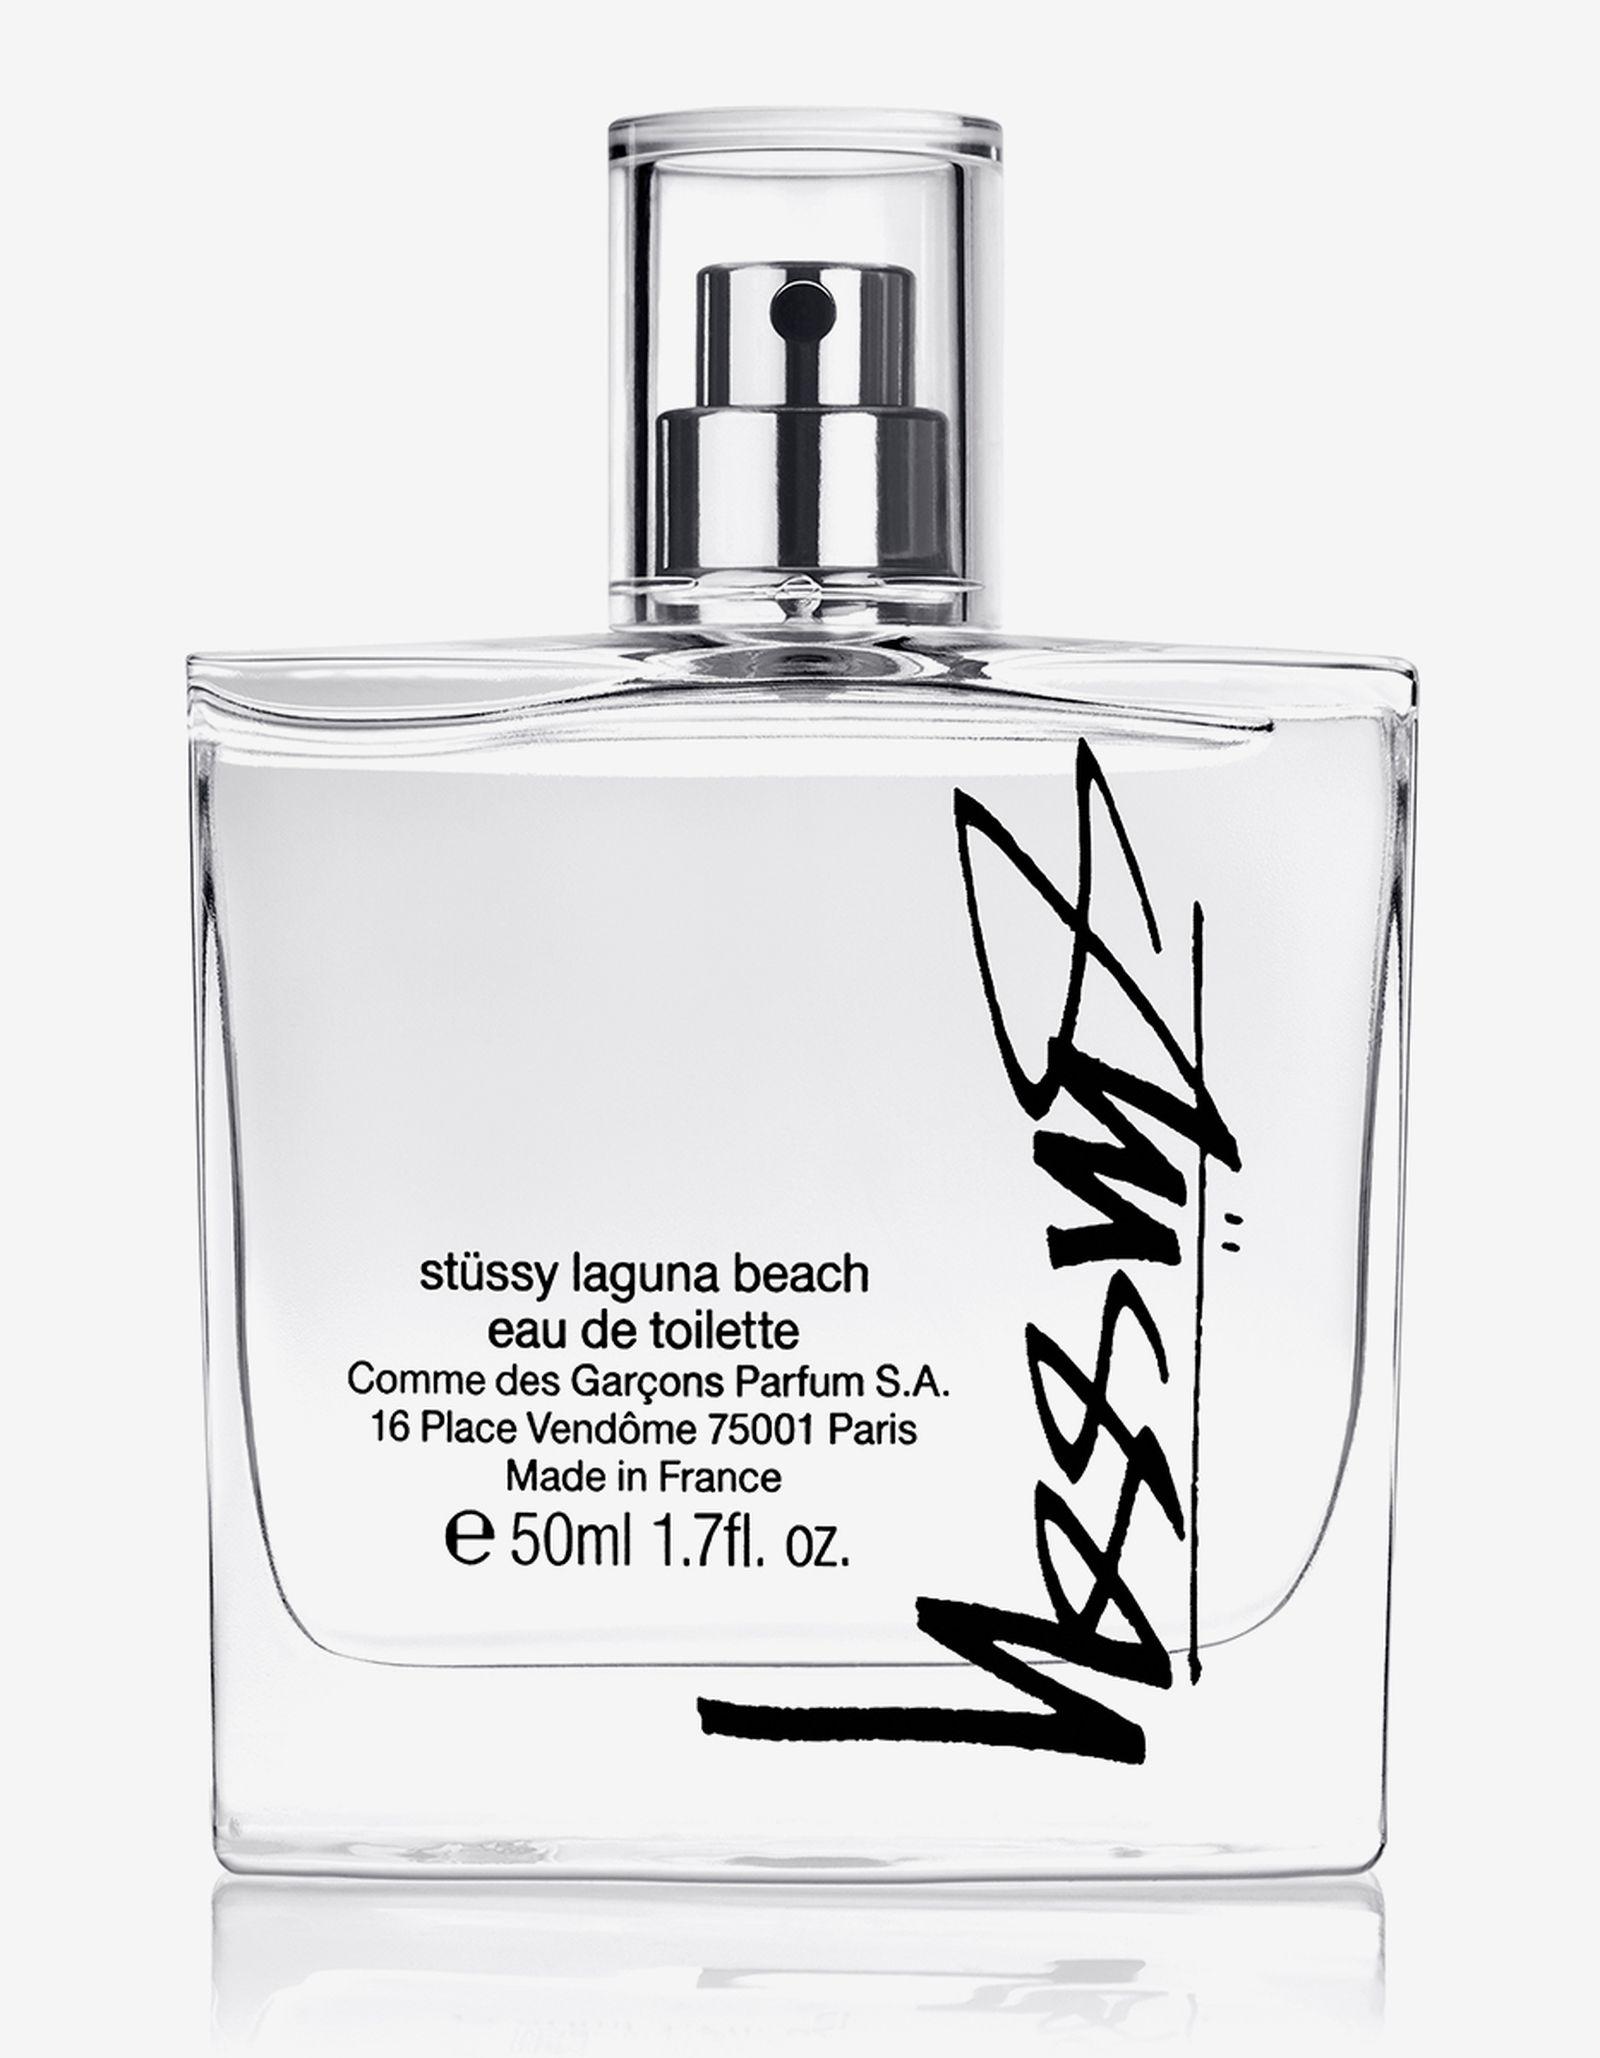 stussy-comme-des-garcons-perfume-1-04